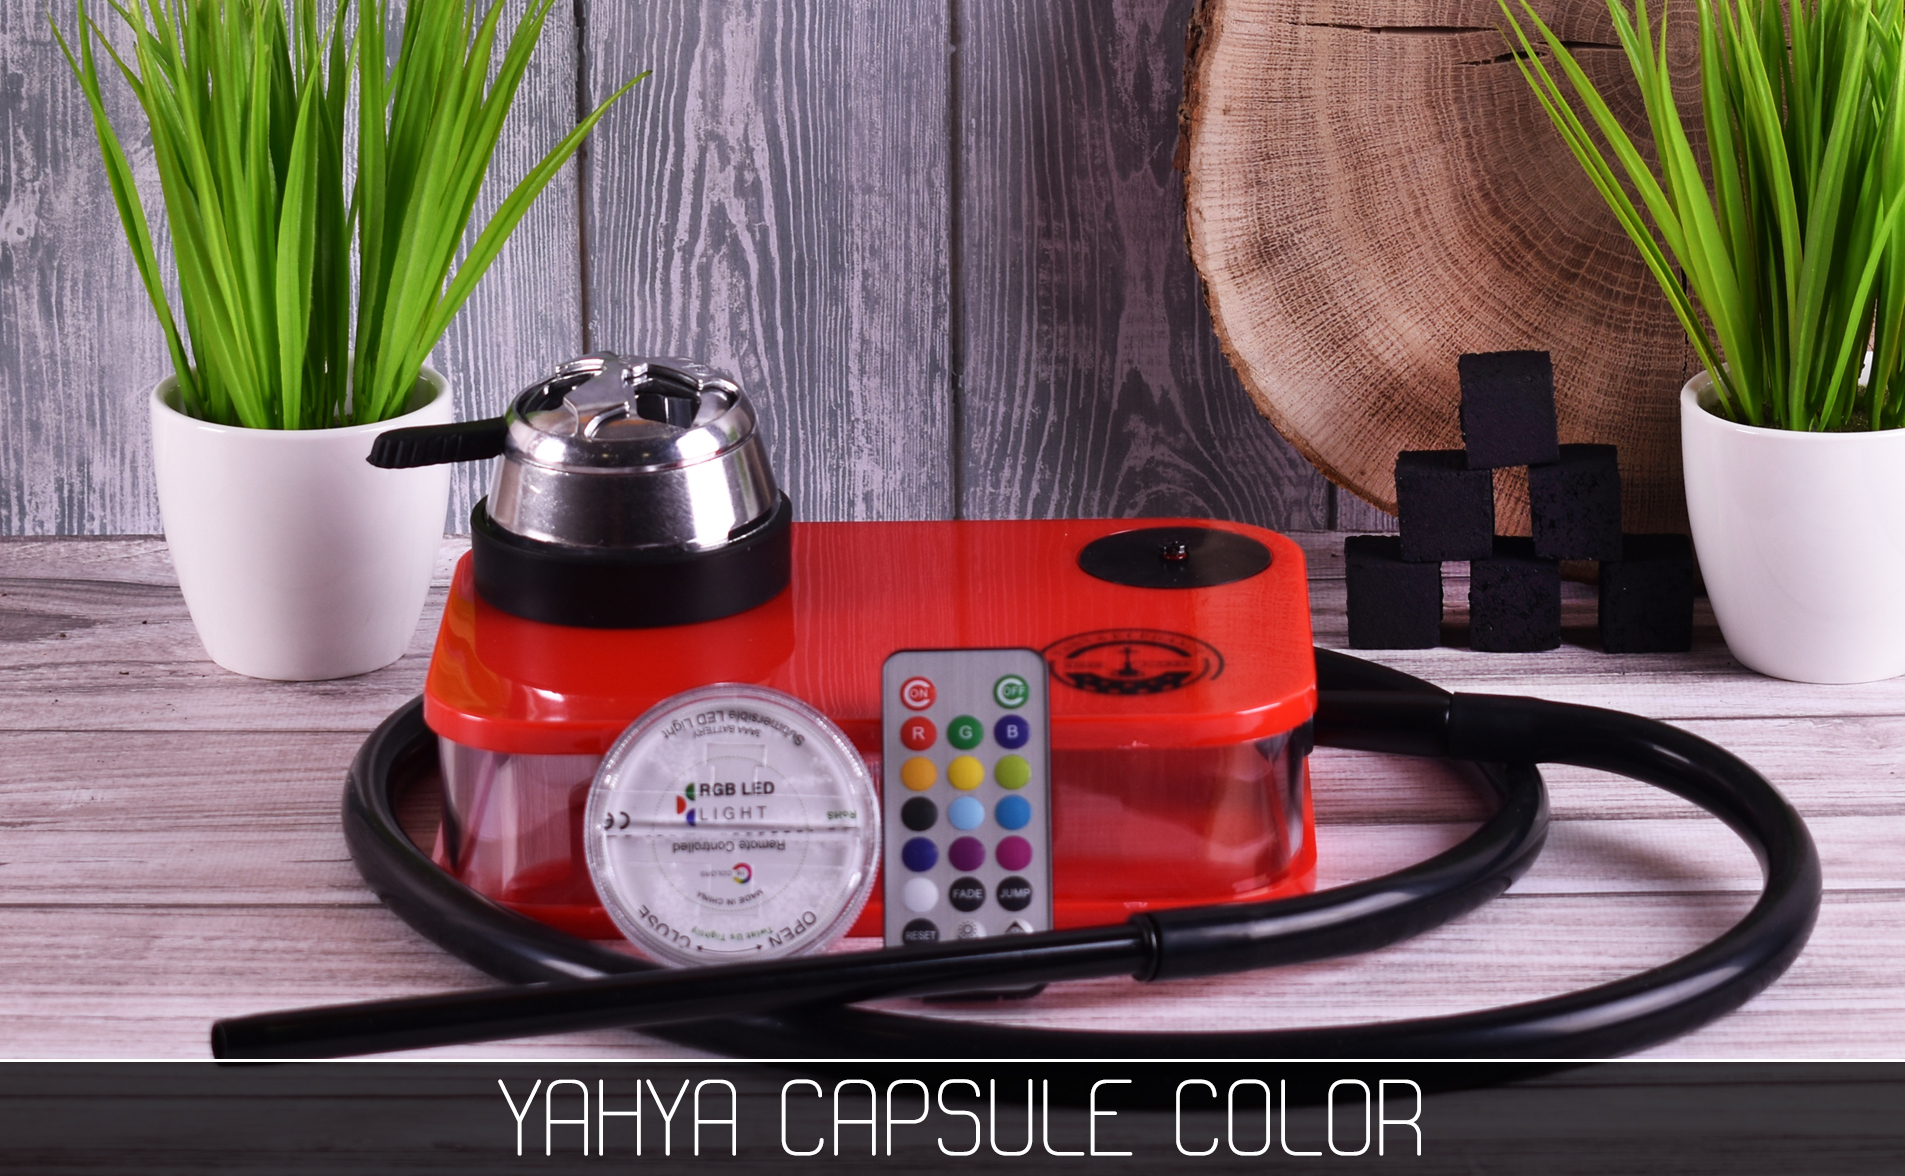 Кальян Yahya Capsule Color - фото 9 - Kalyanchik.ua